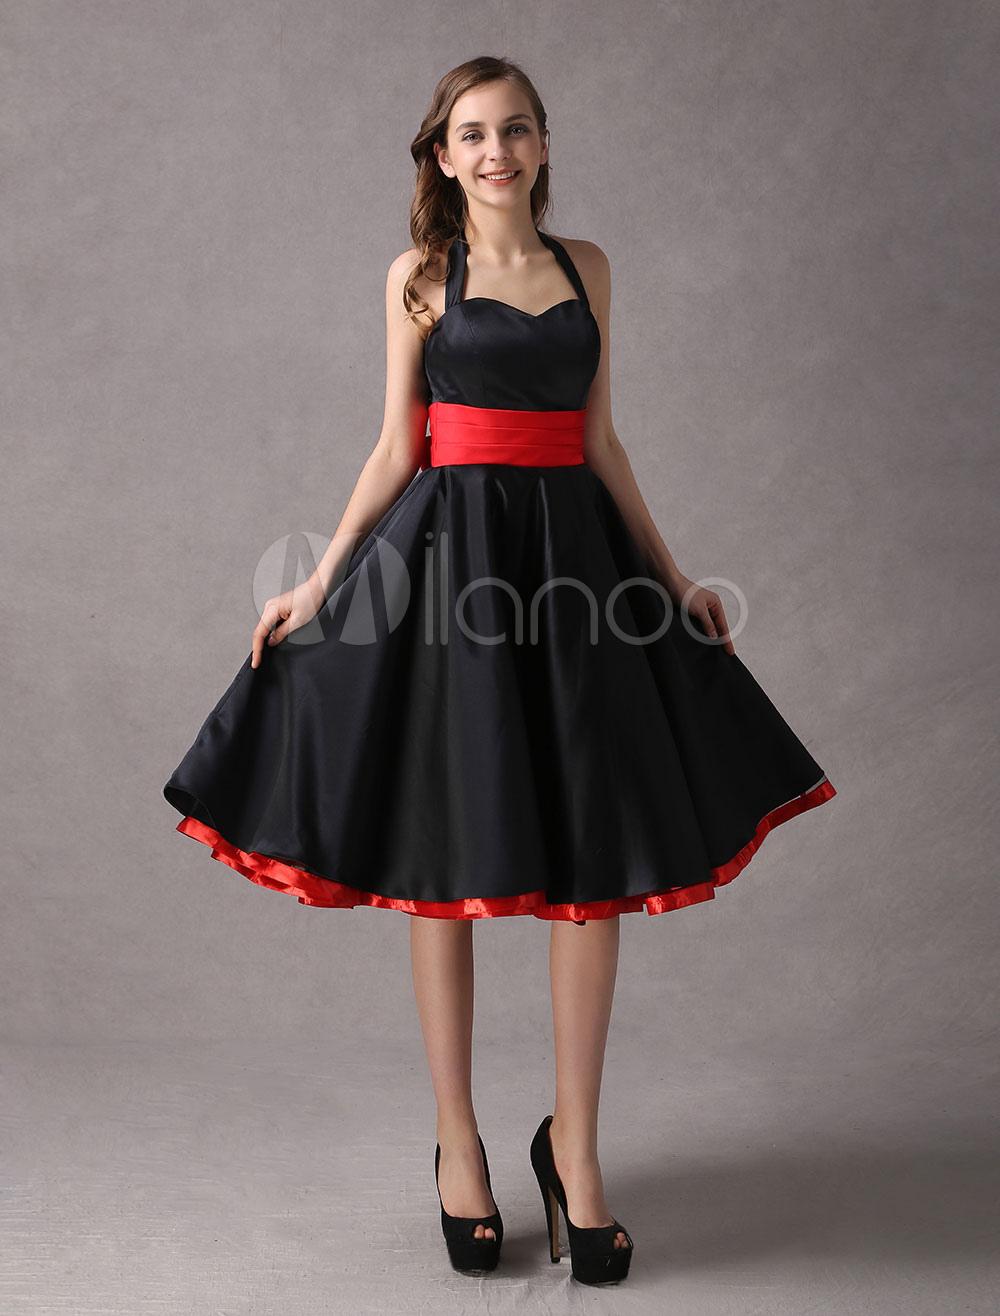 Rockabilly Bridesmaid Dresses Black Vintage Halter Sweetheart Neckline Pleated Bow Sash Straps Tea Length Wedding Party Dress photo